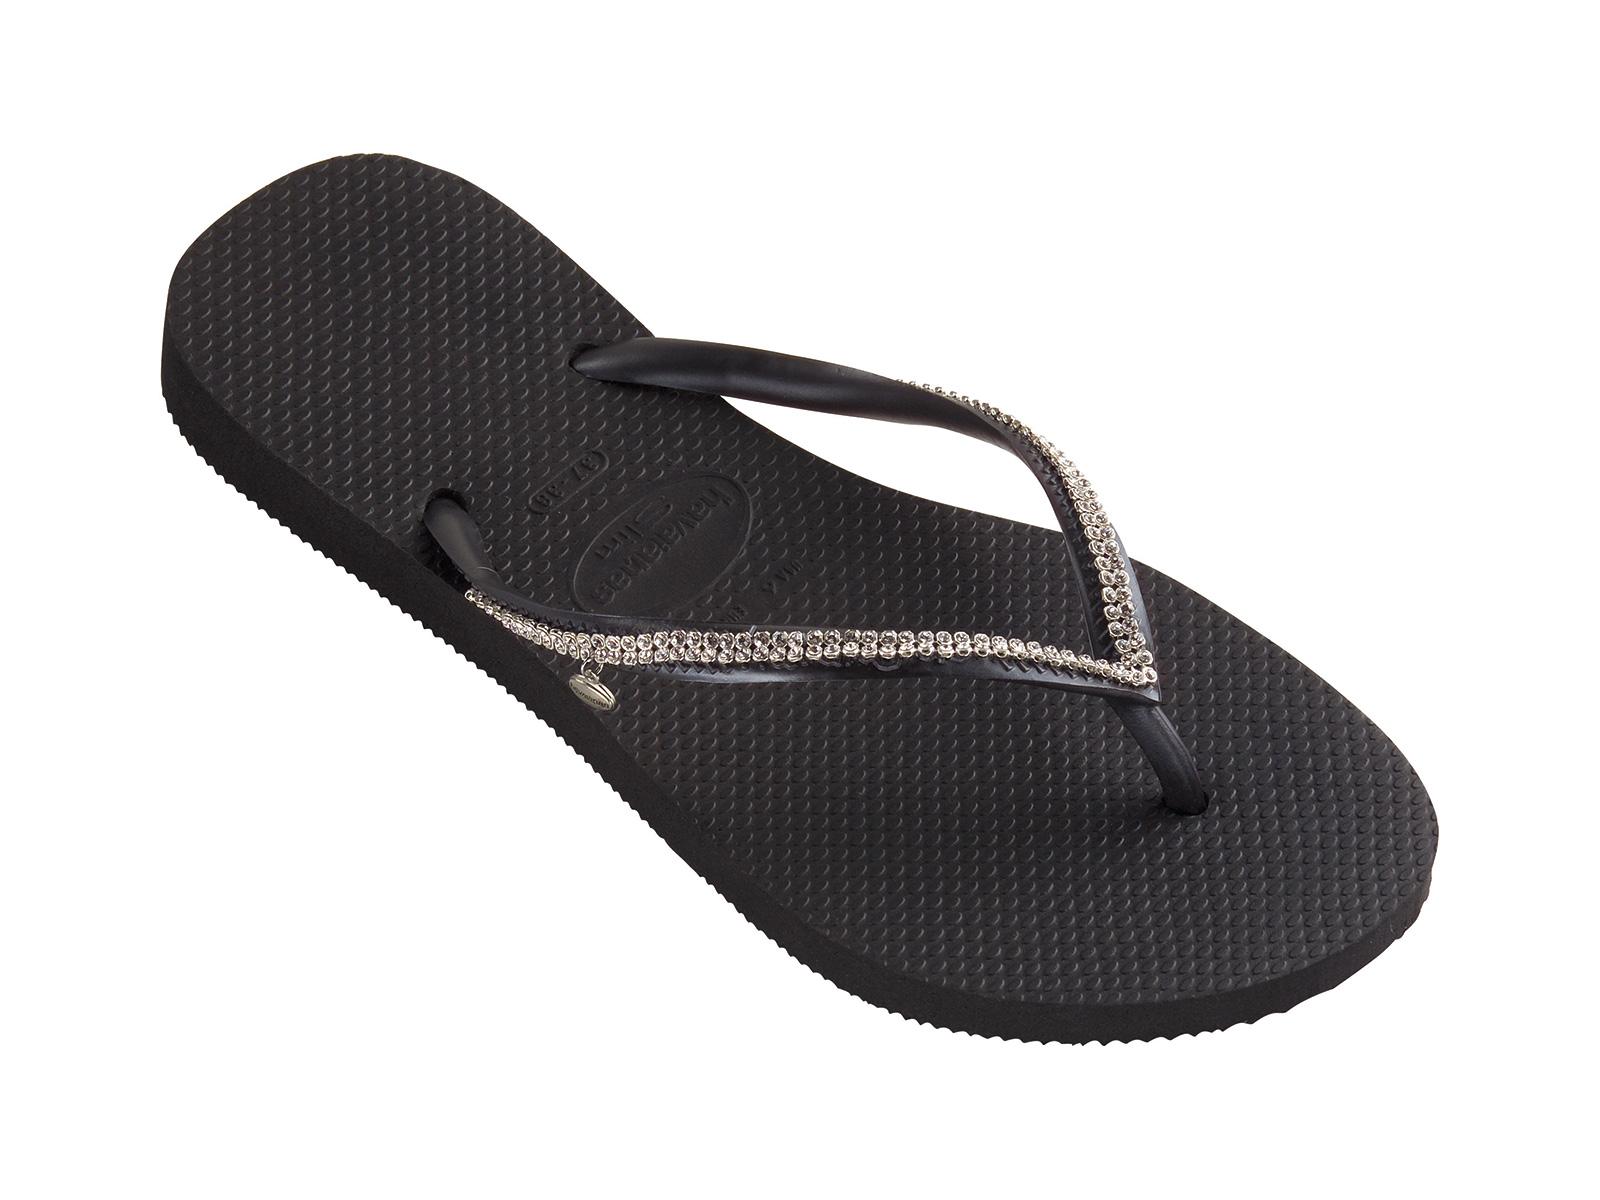 2297432aad96 Black Flip-flops With Swarovski Crystals - Slim Crystal Mesh Sw Black -  Havaianas